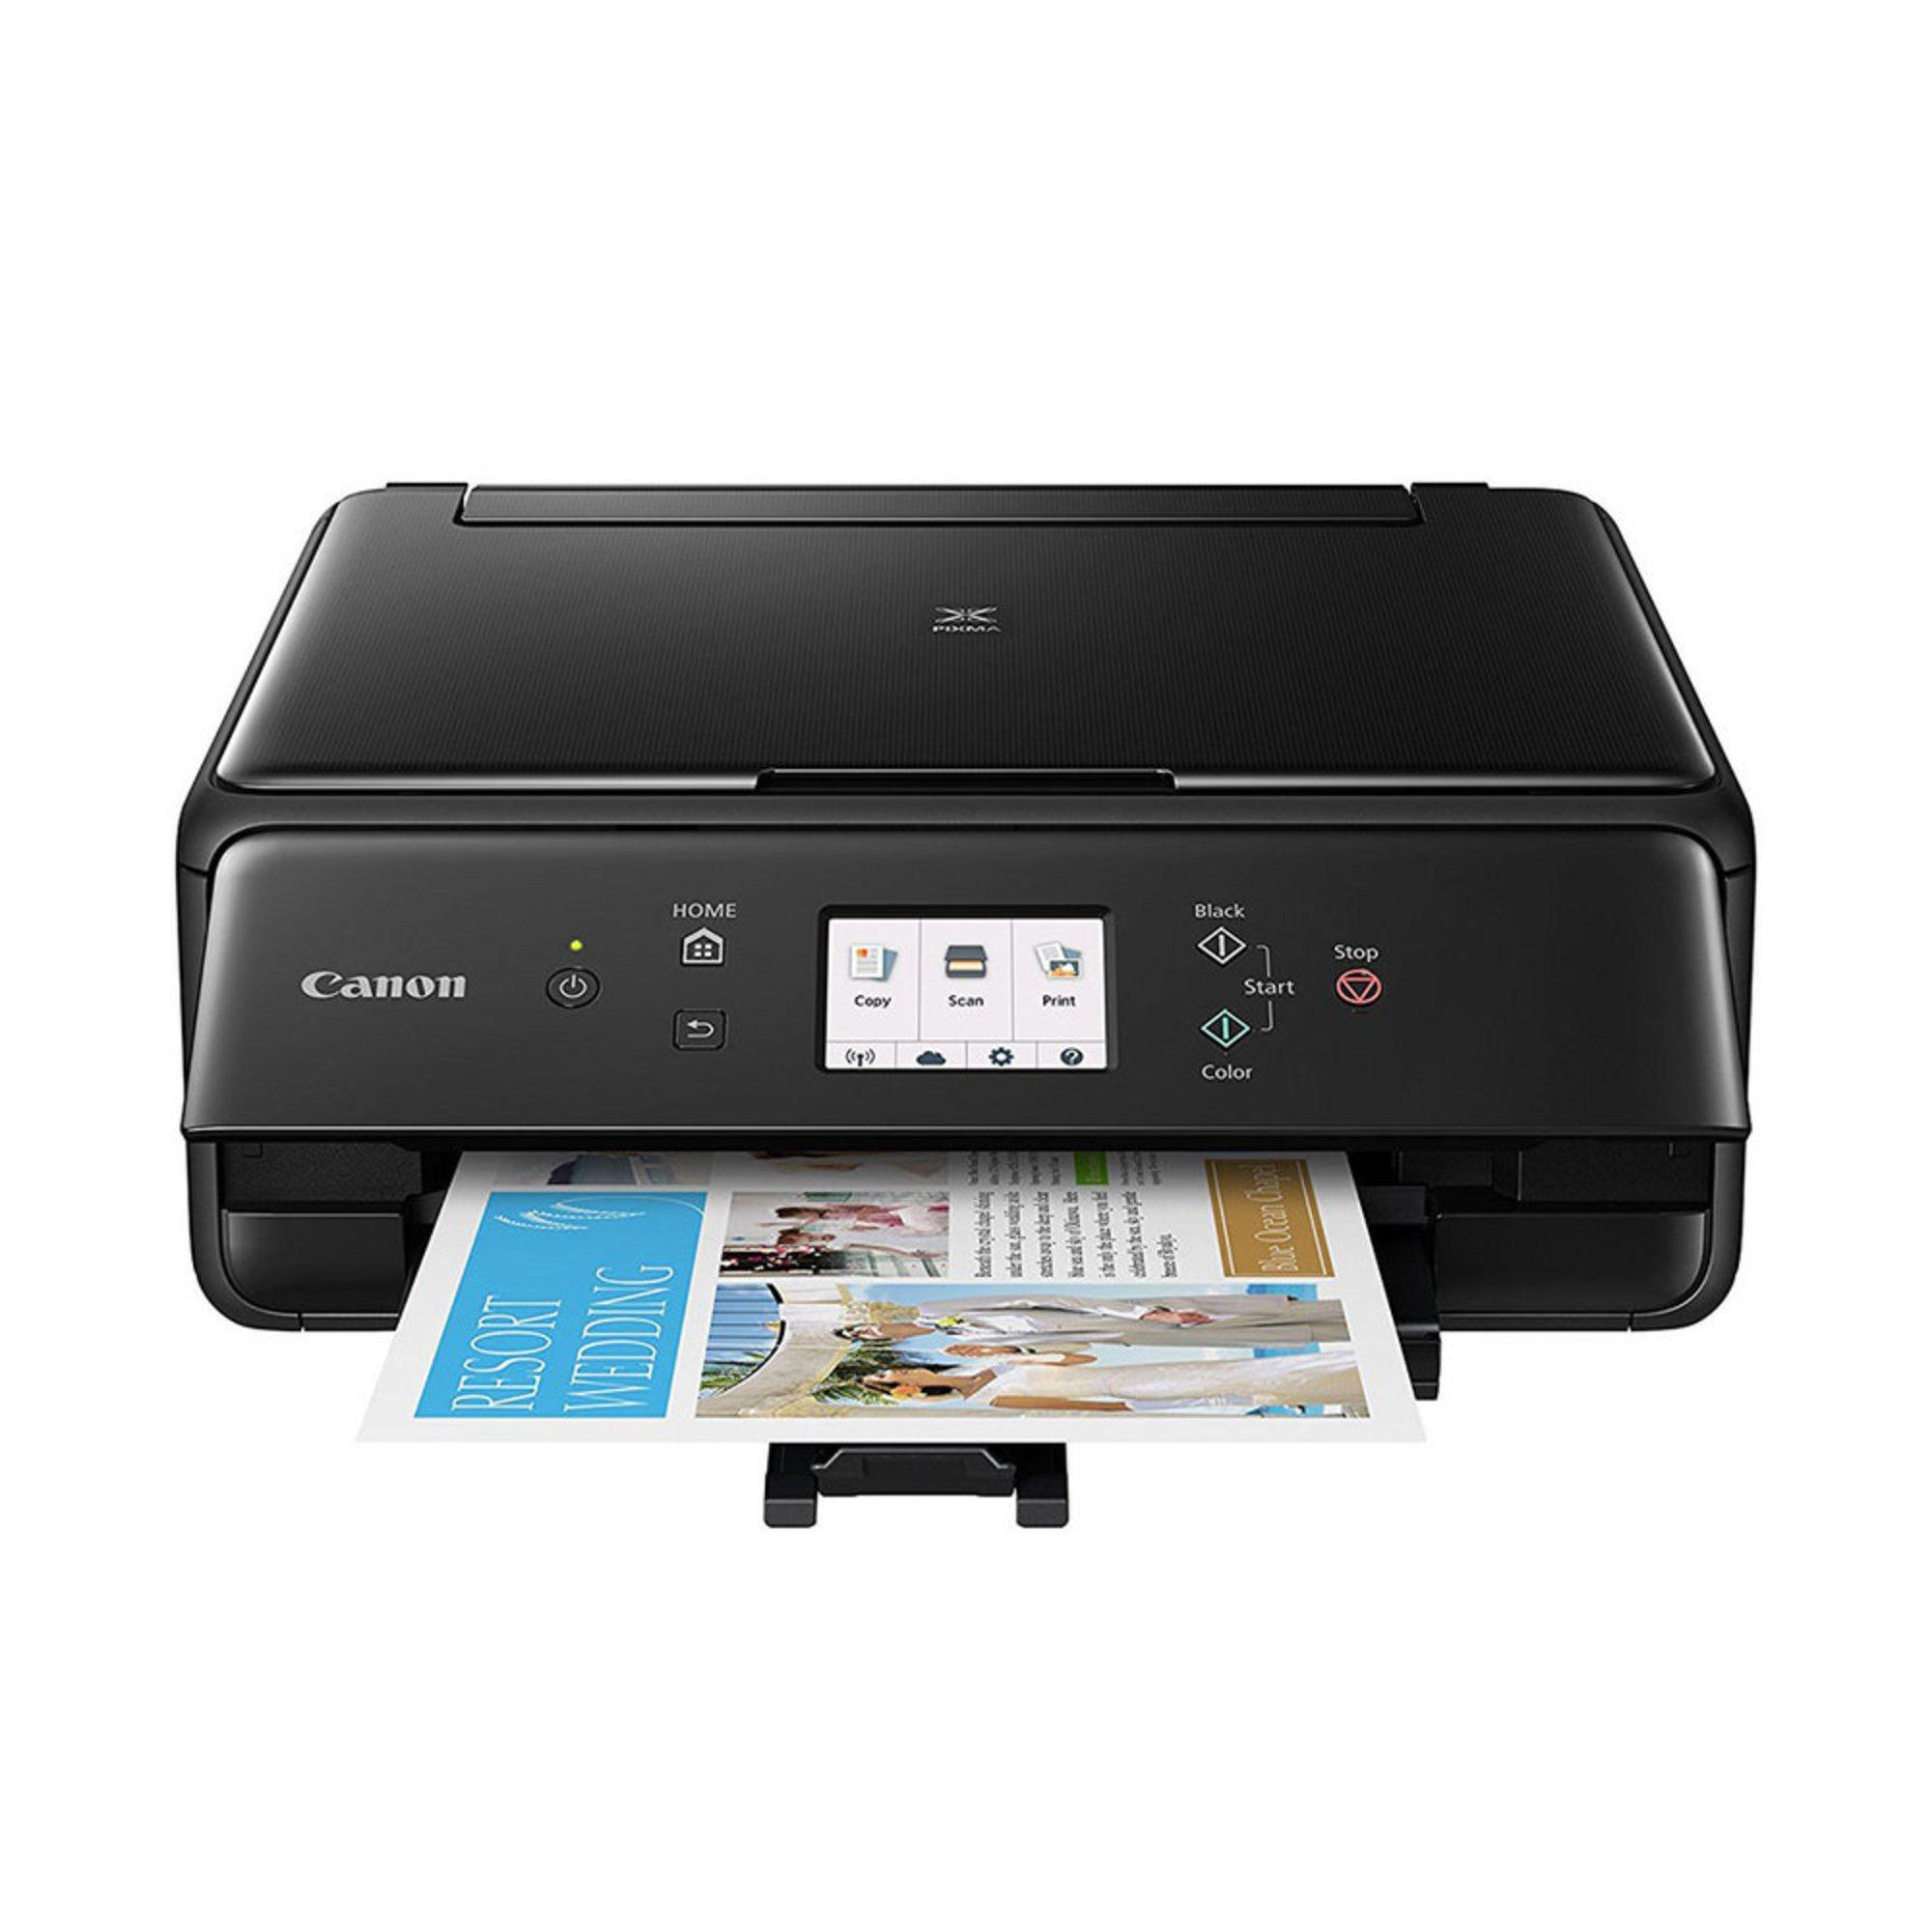 Canon Pixma TS6120 All-In-One Wireless Inkjet Printer - Black